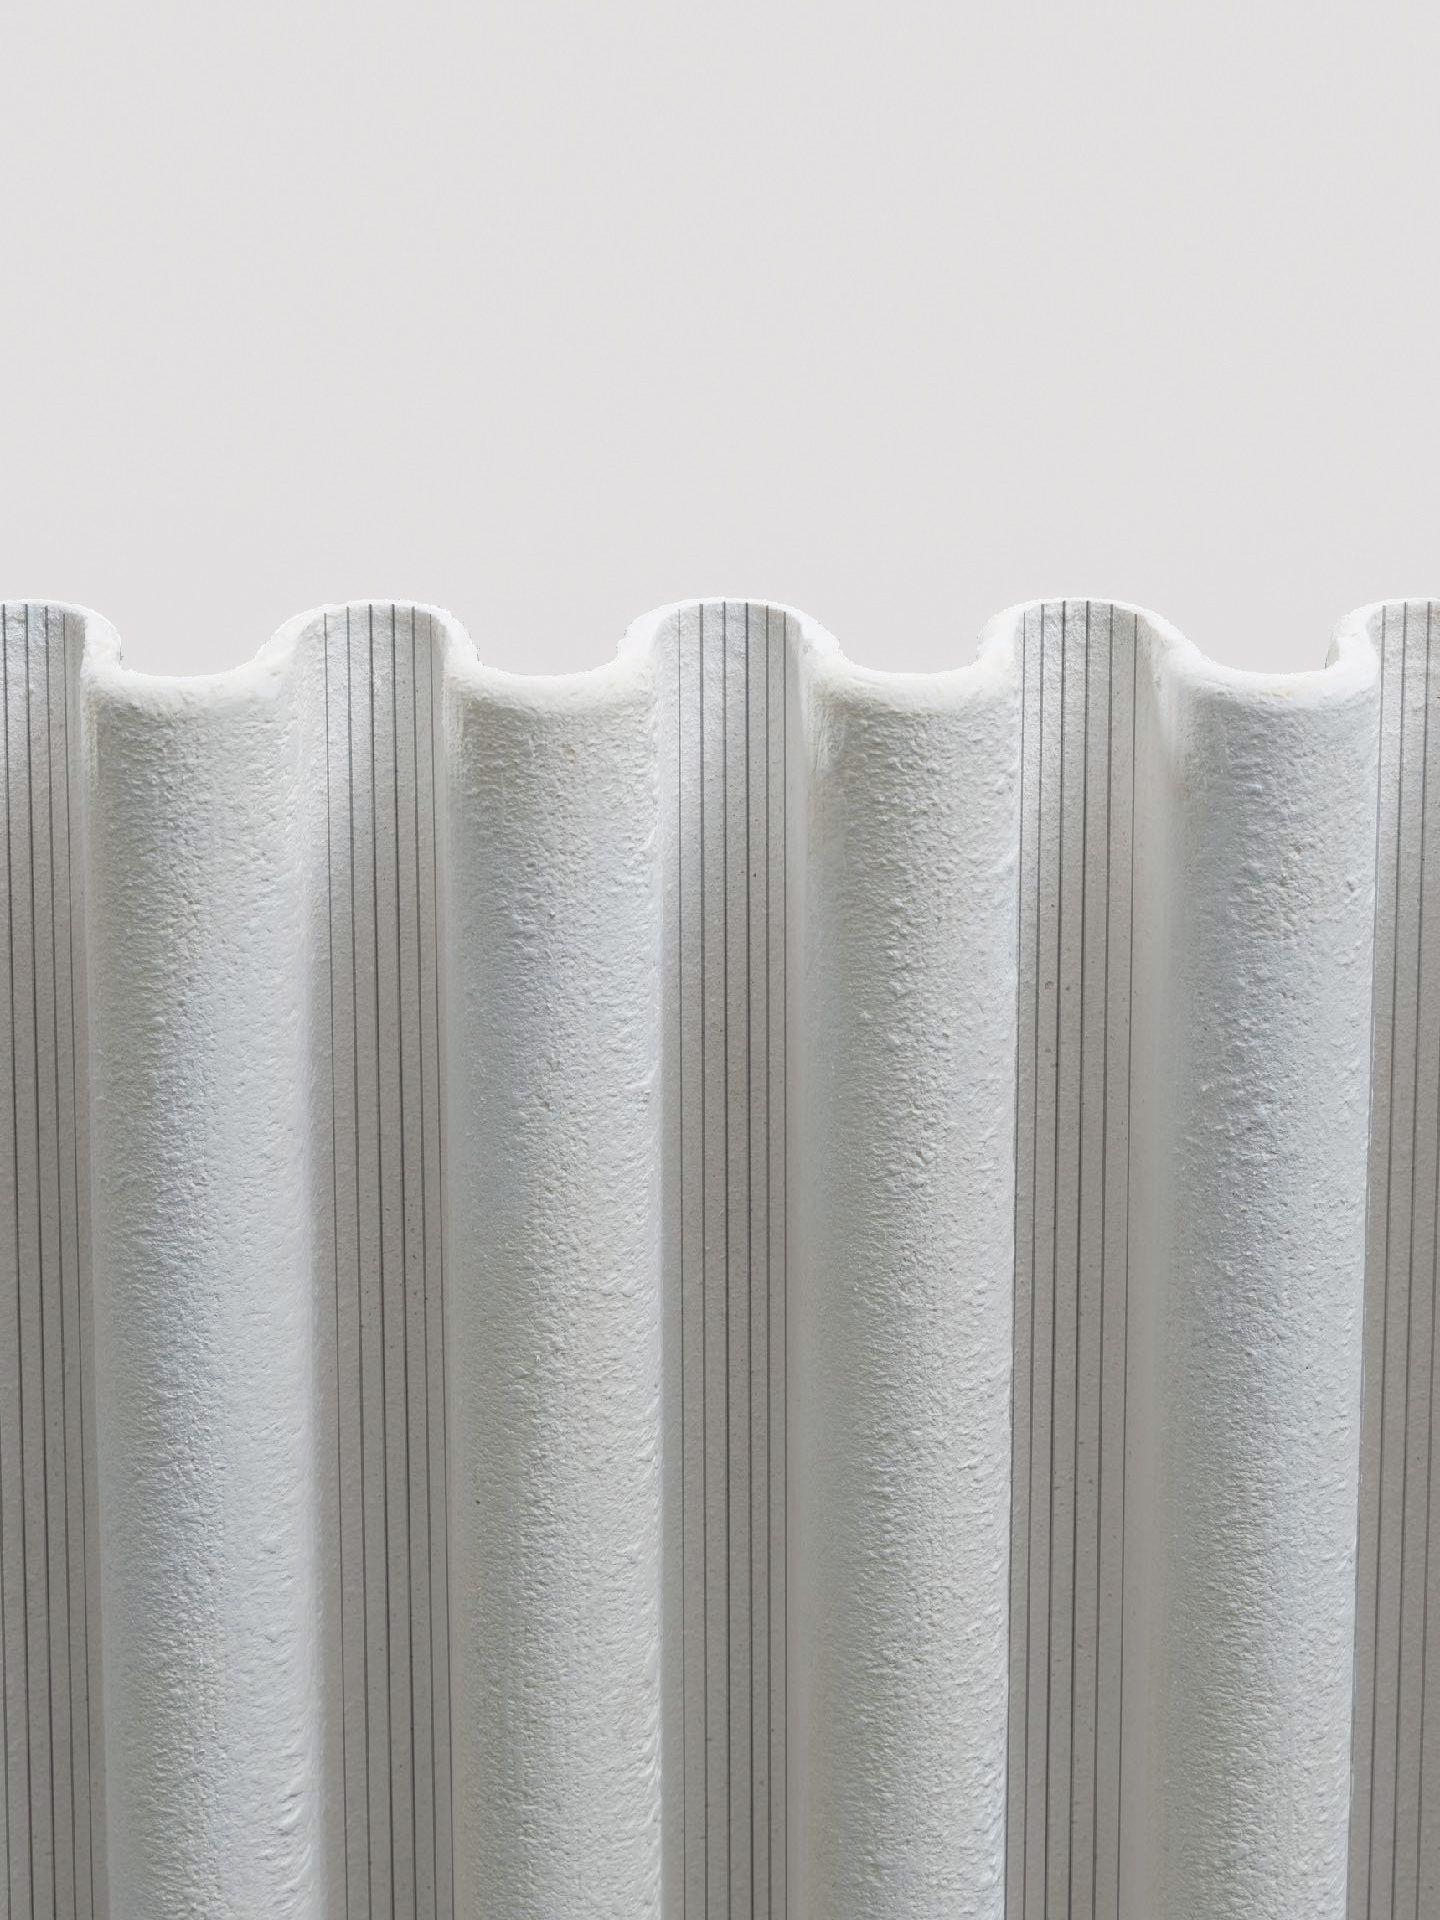 IGNANT-Design-LouisCourcier-5